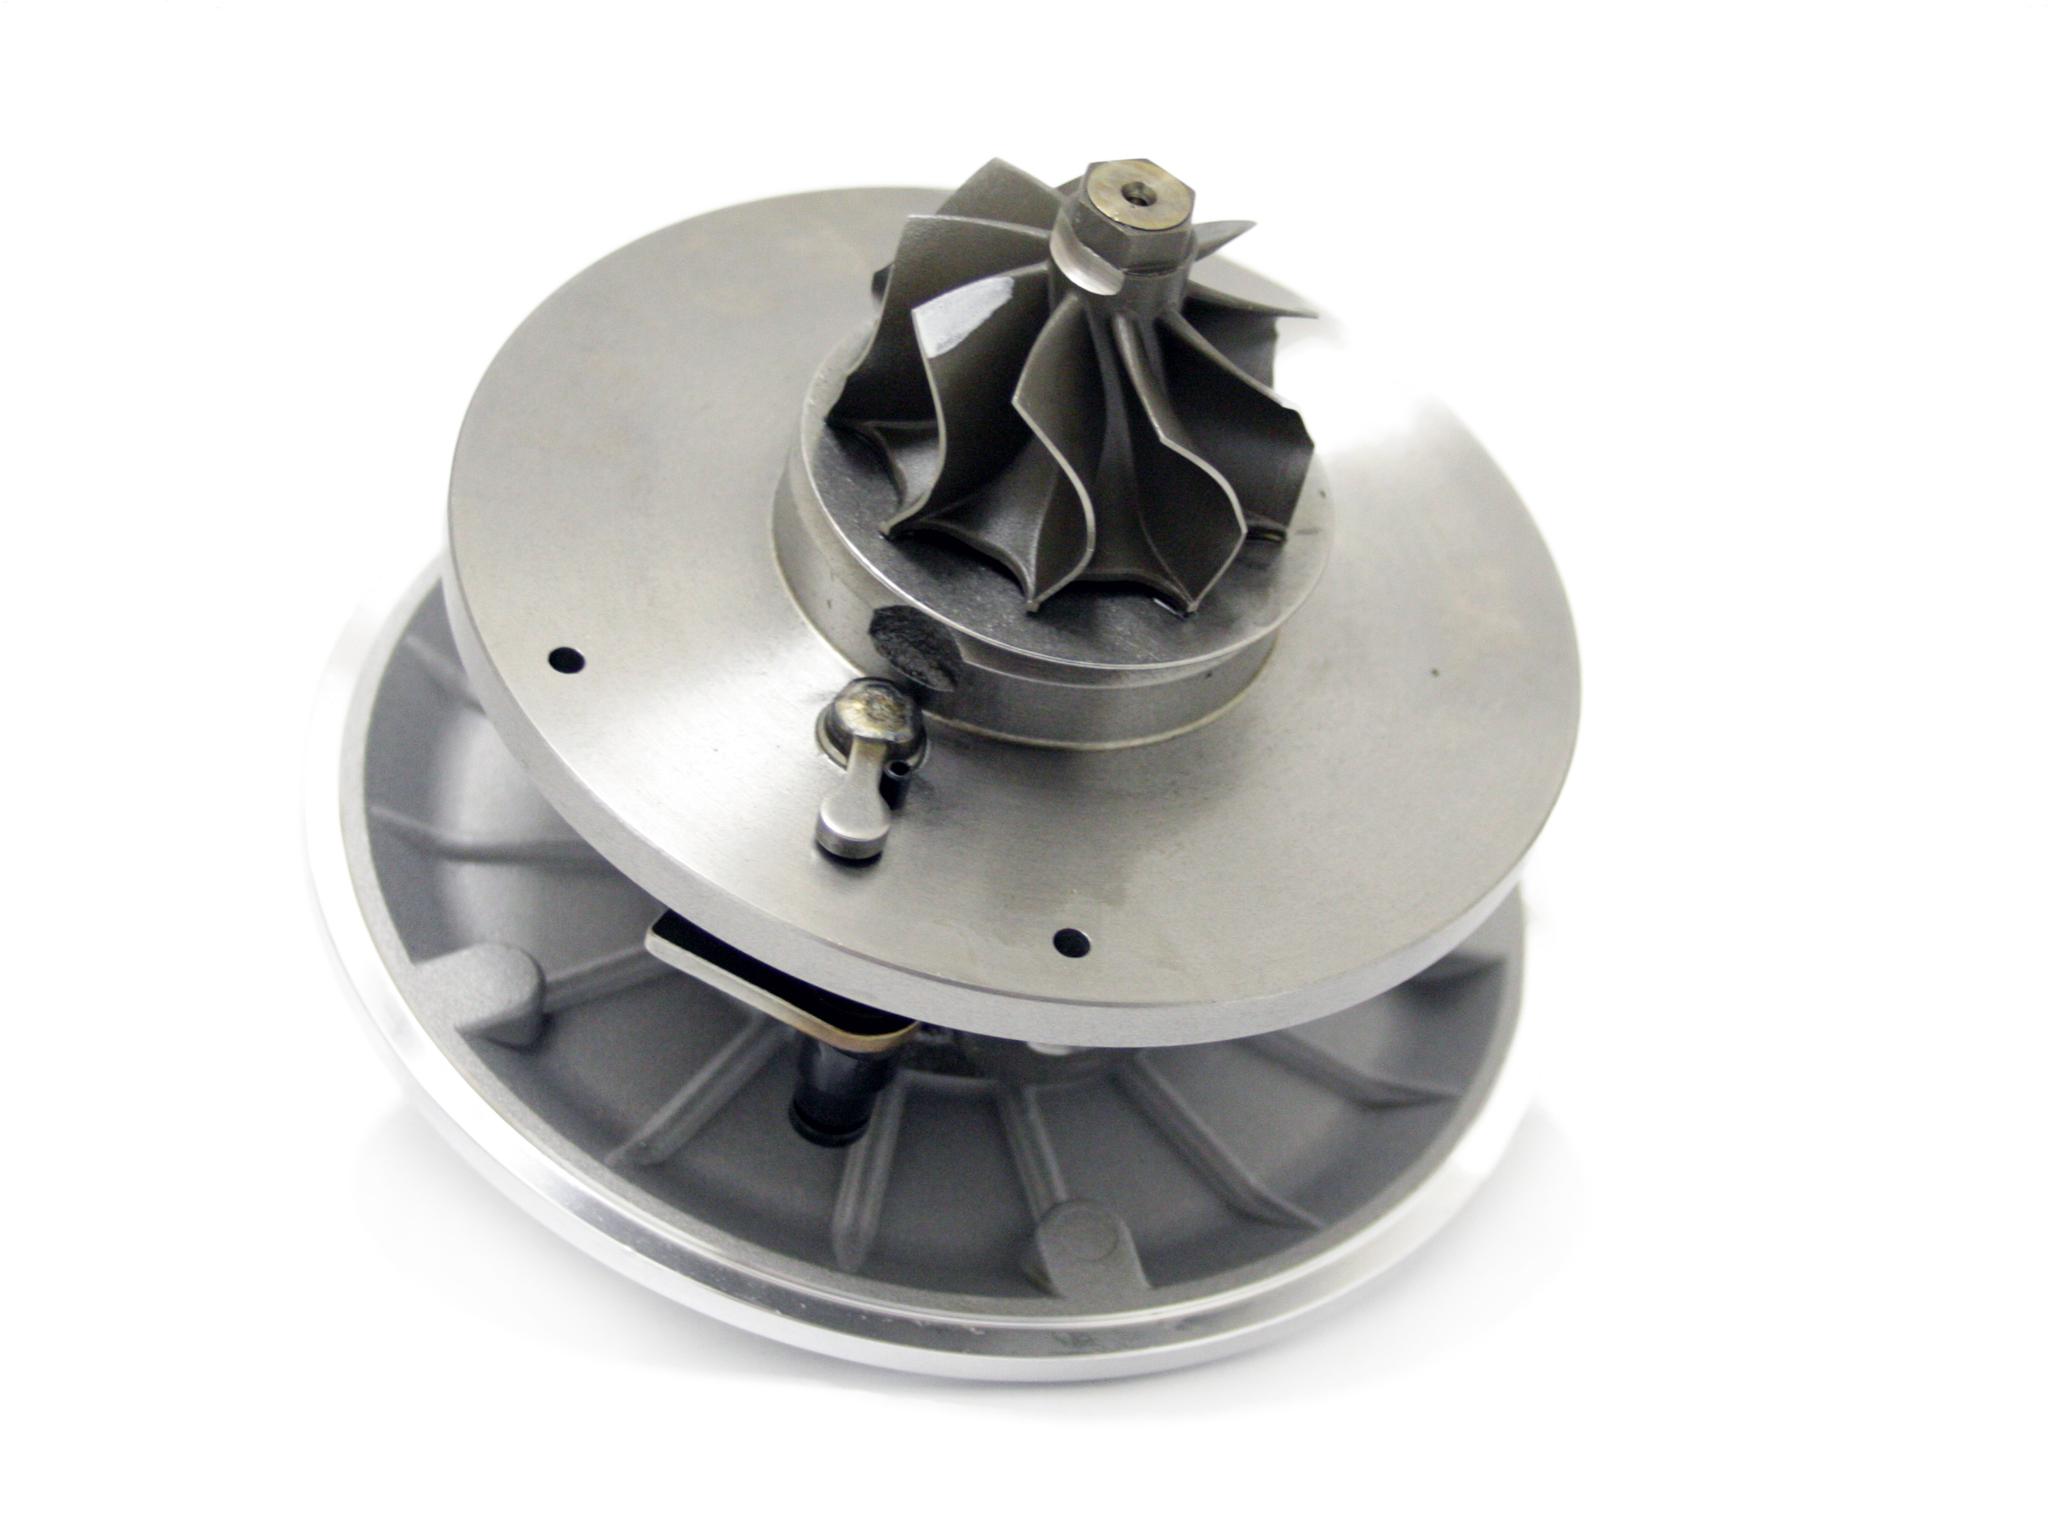 Картридж турбины GTA1749V Вольво 2.0 D4204T 136 л.с.